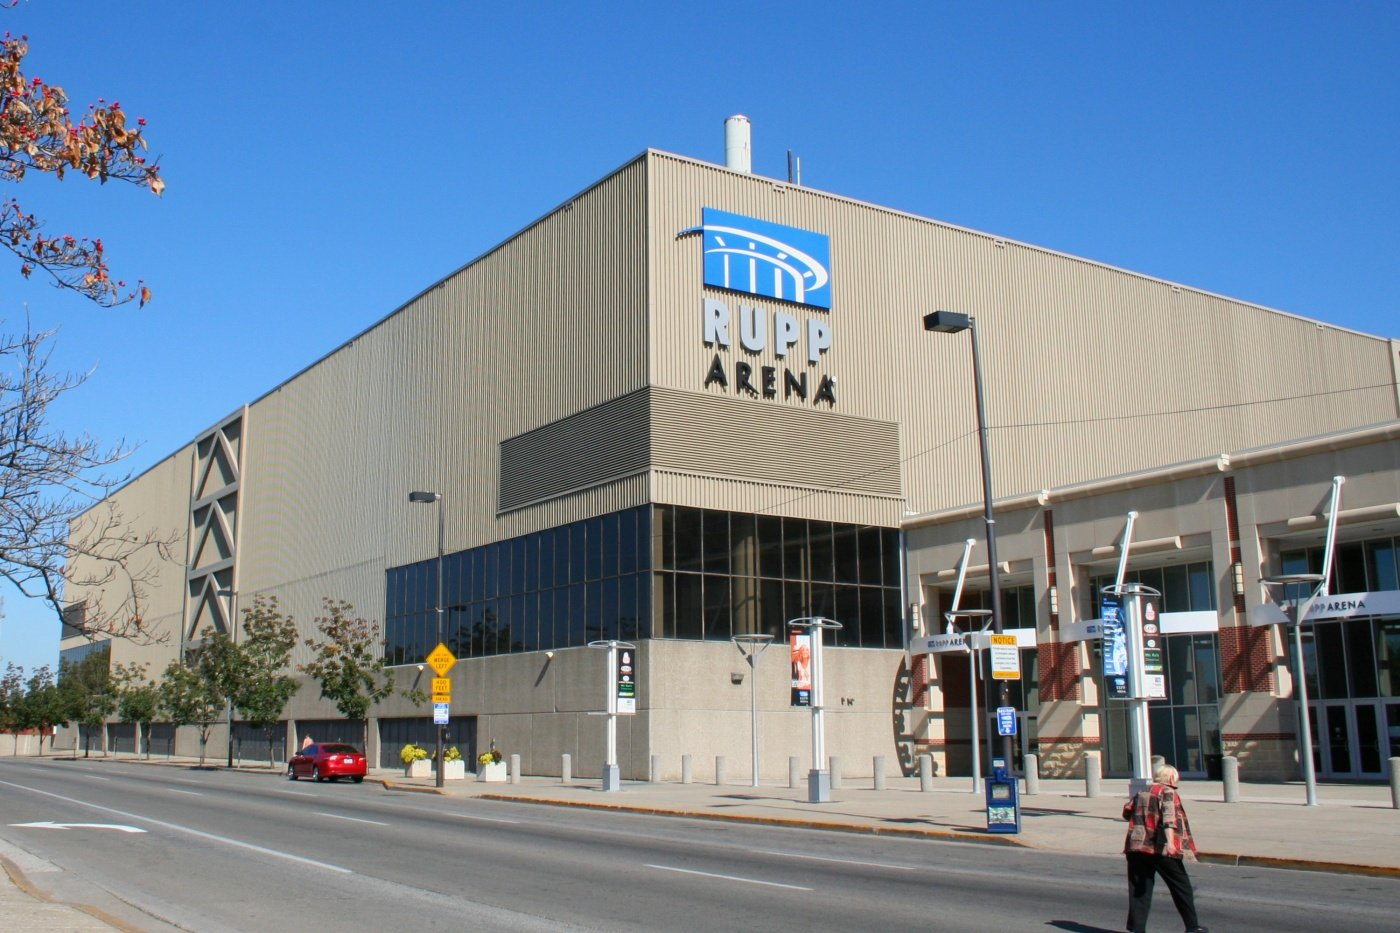 Exterior of Rupp Arena